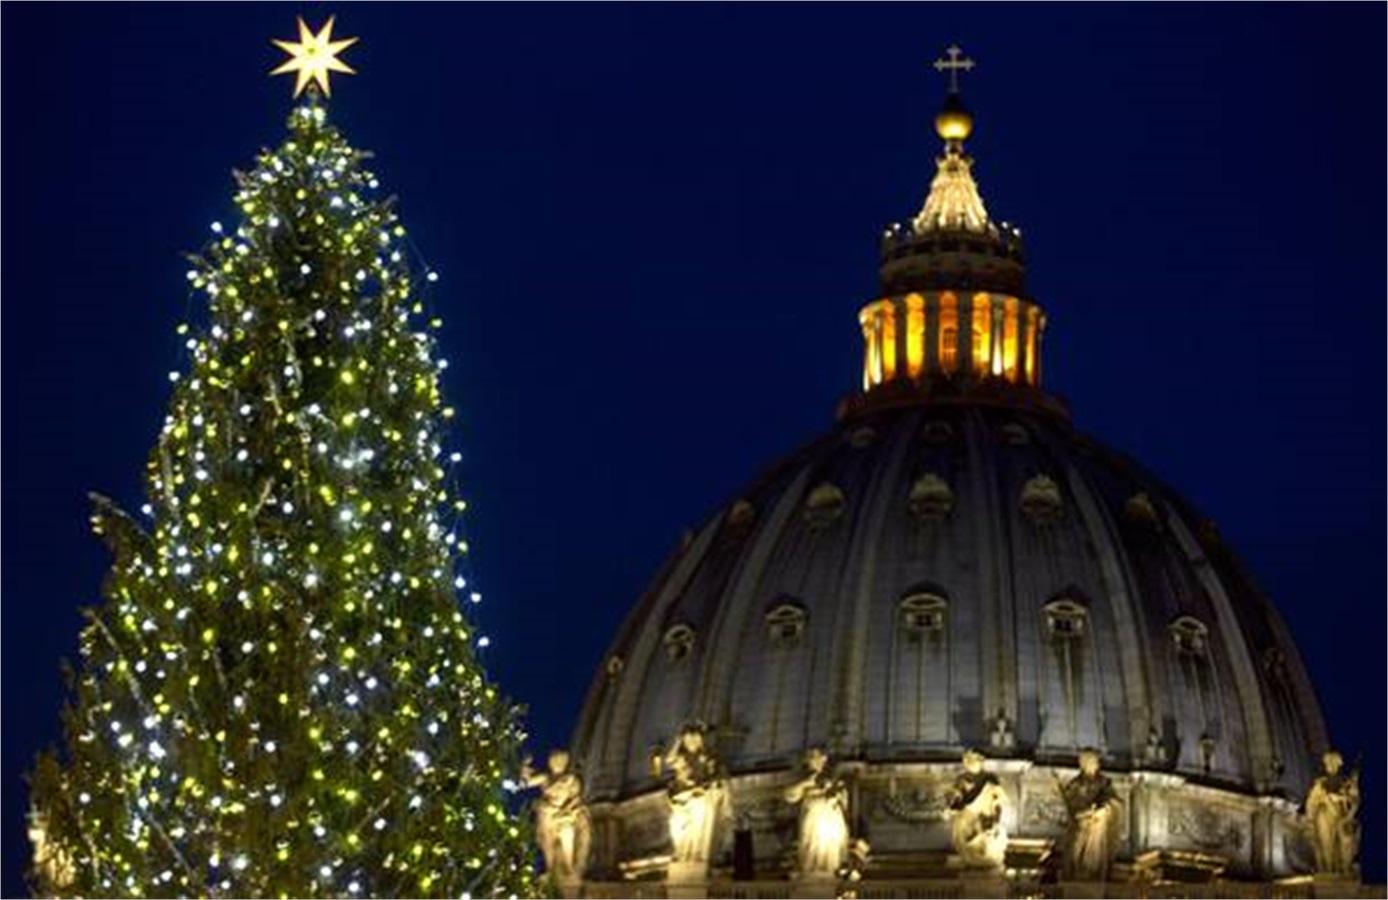 О ночном Ватикане сняли фильм